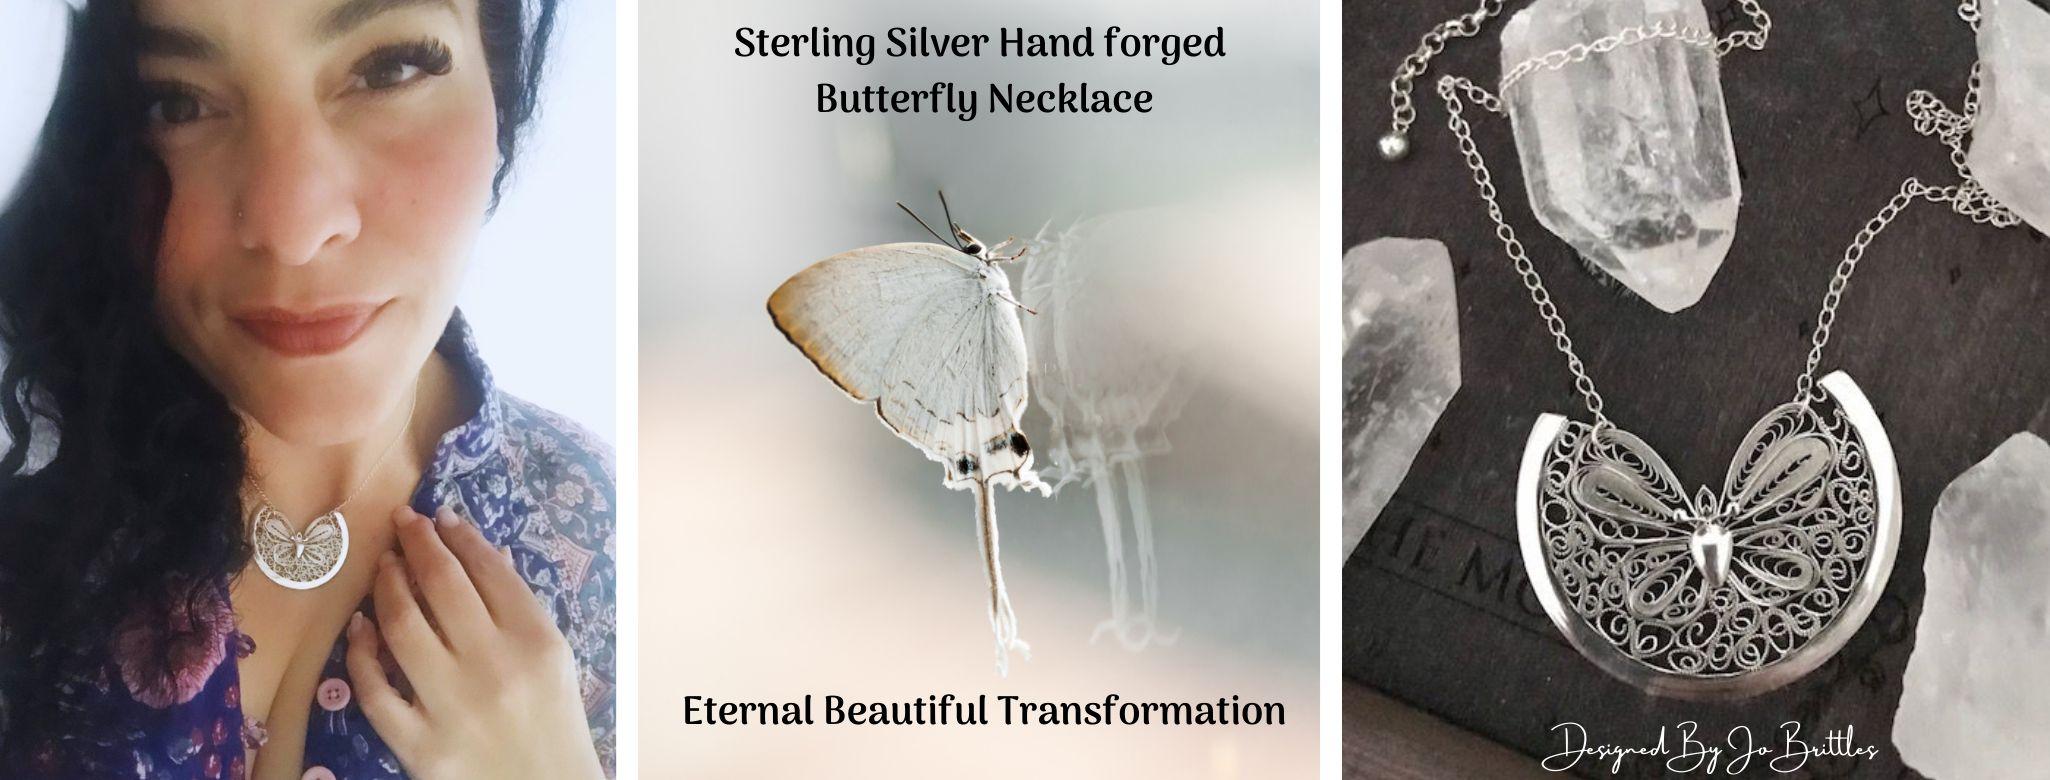 butterfly-necklance-banner.jpg